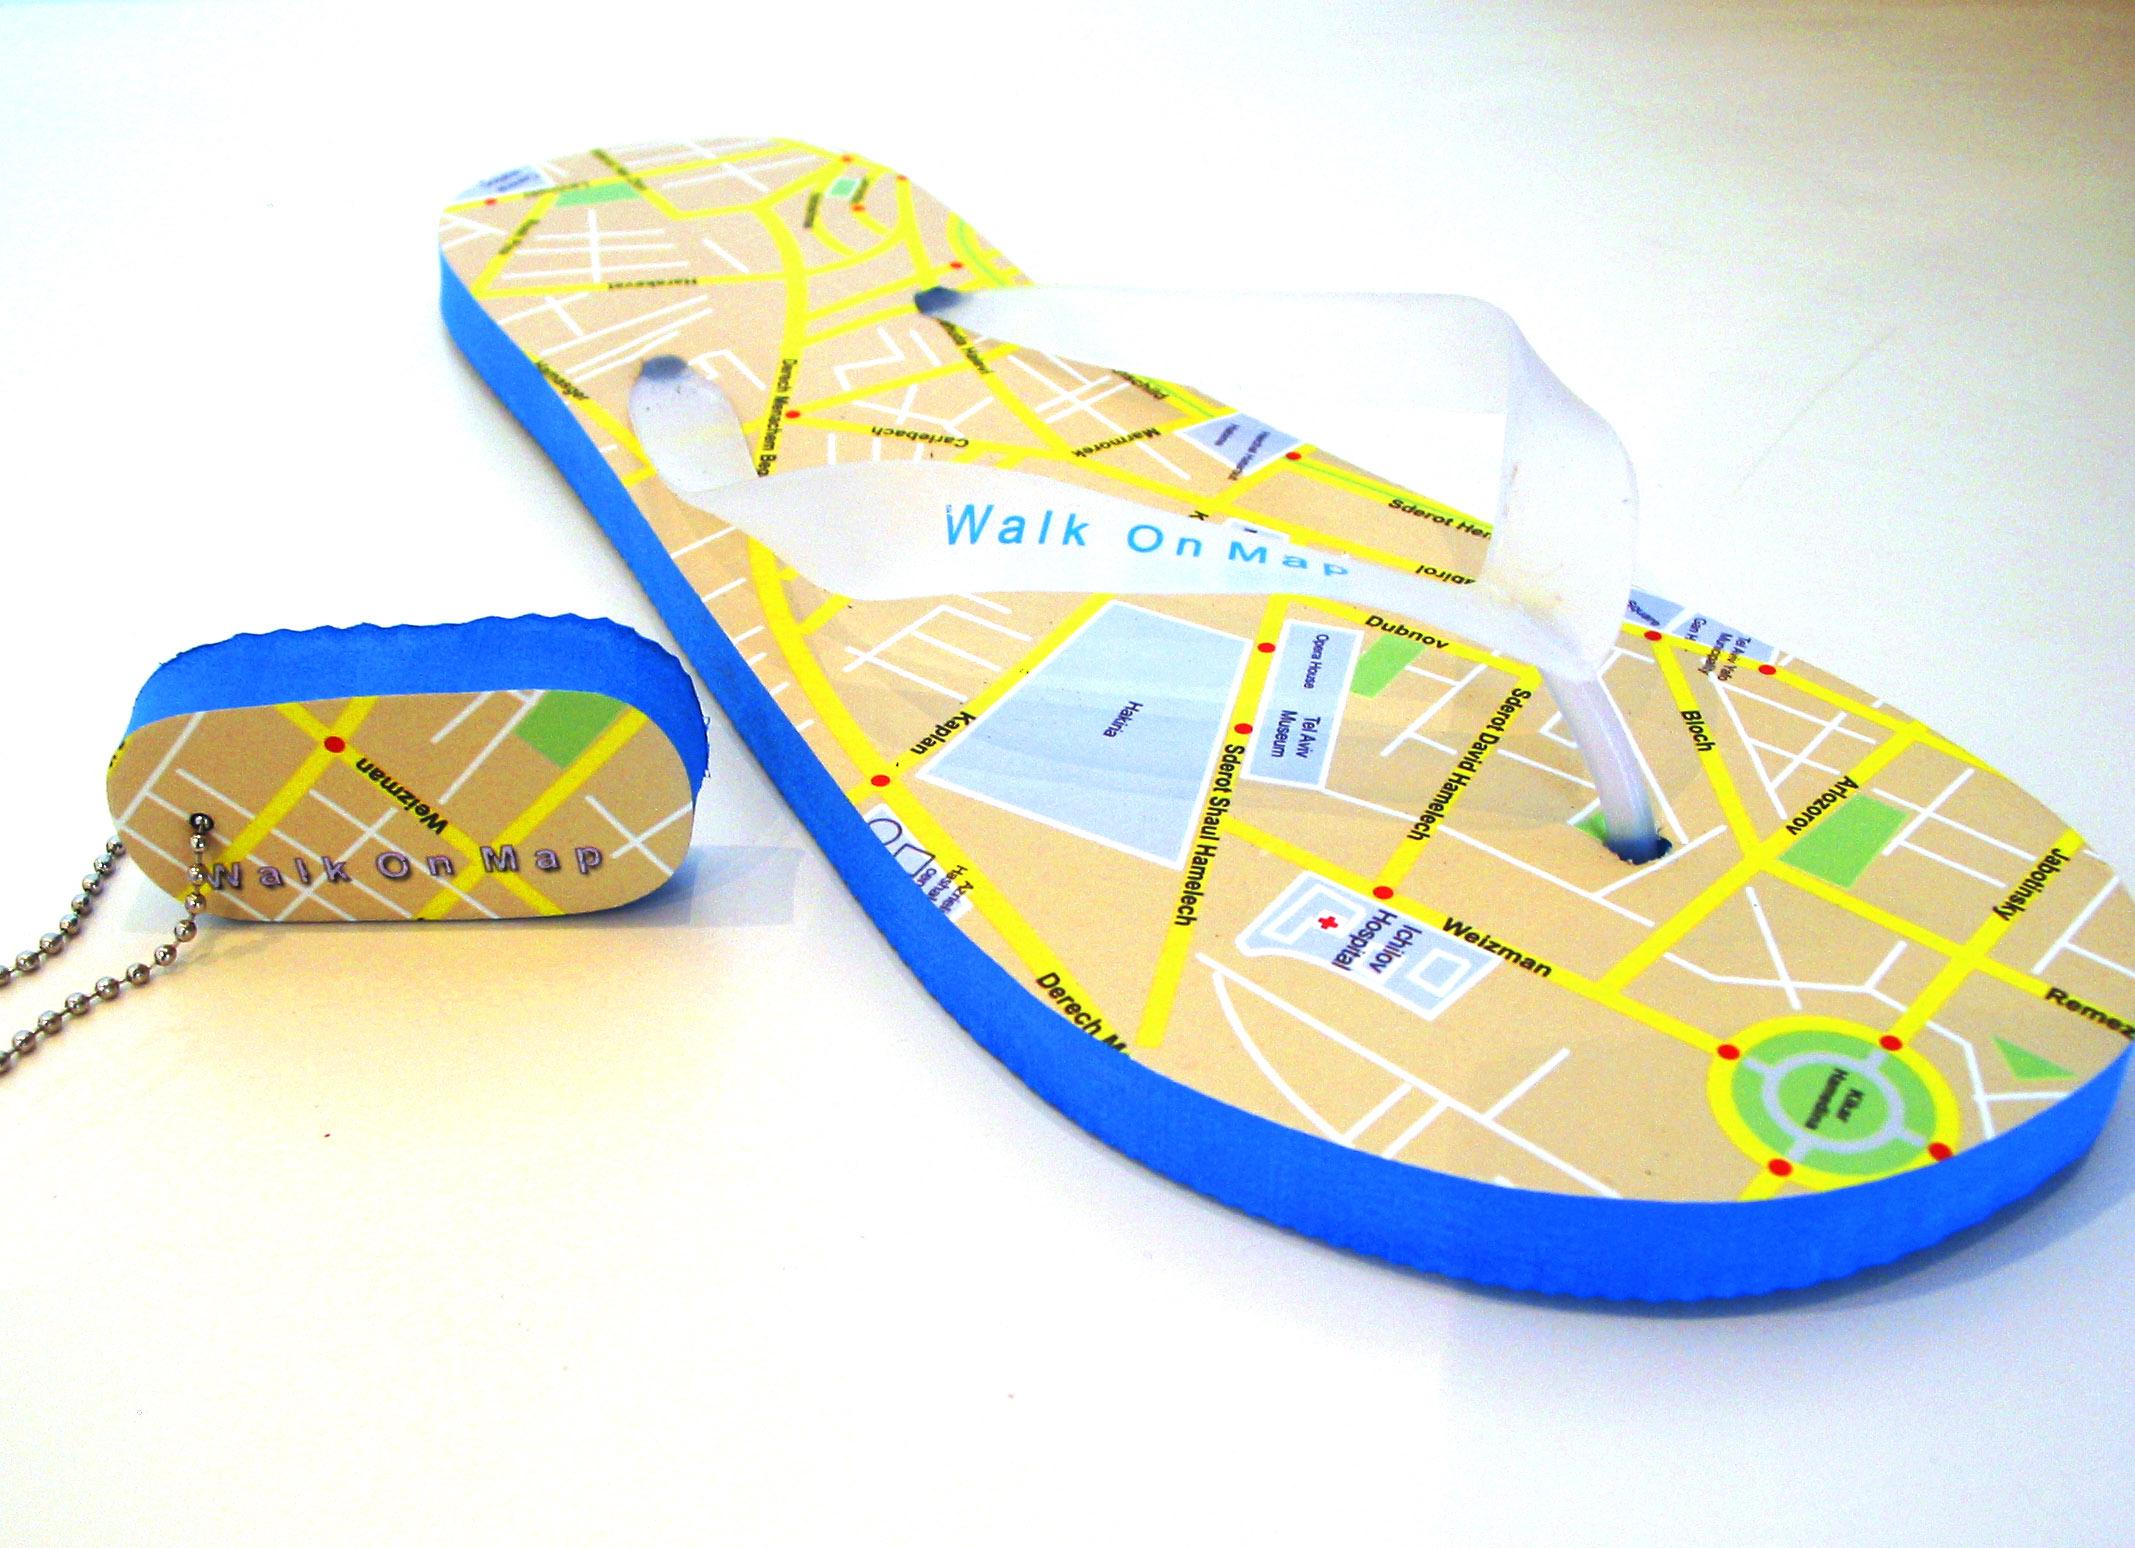 94bcdc2aea083 Buy Flip-Flop Israeli Sandals with a Twist